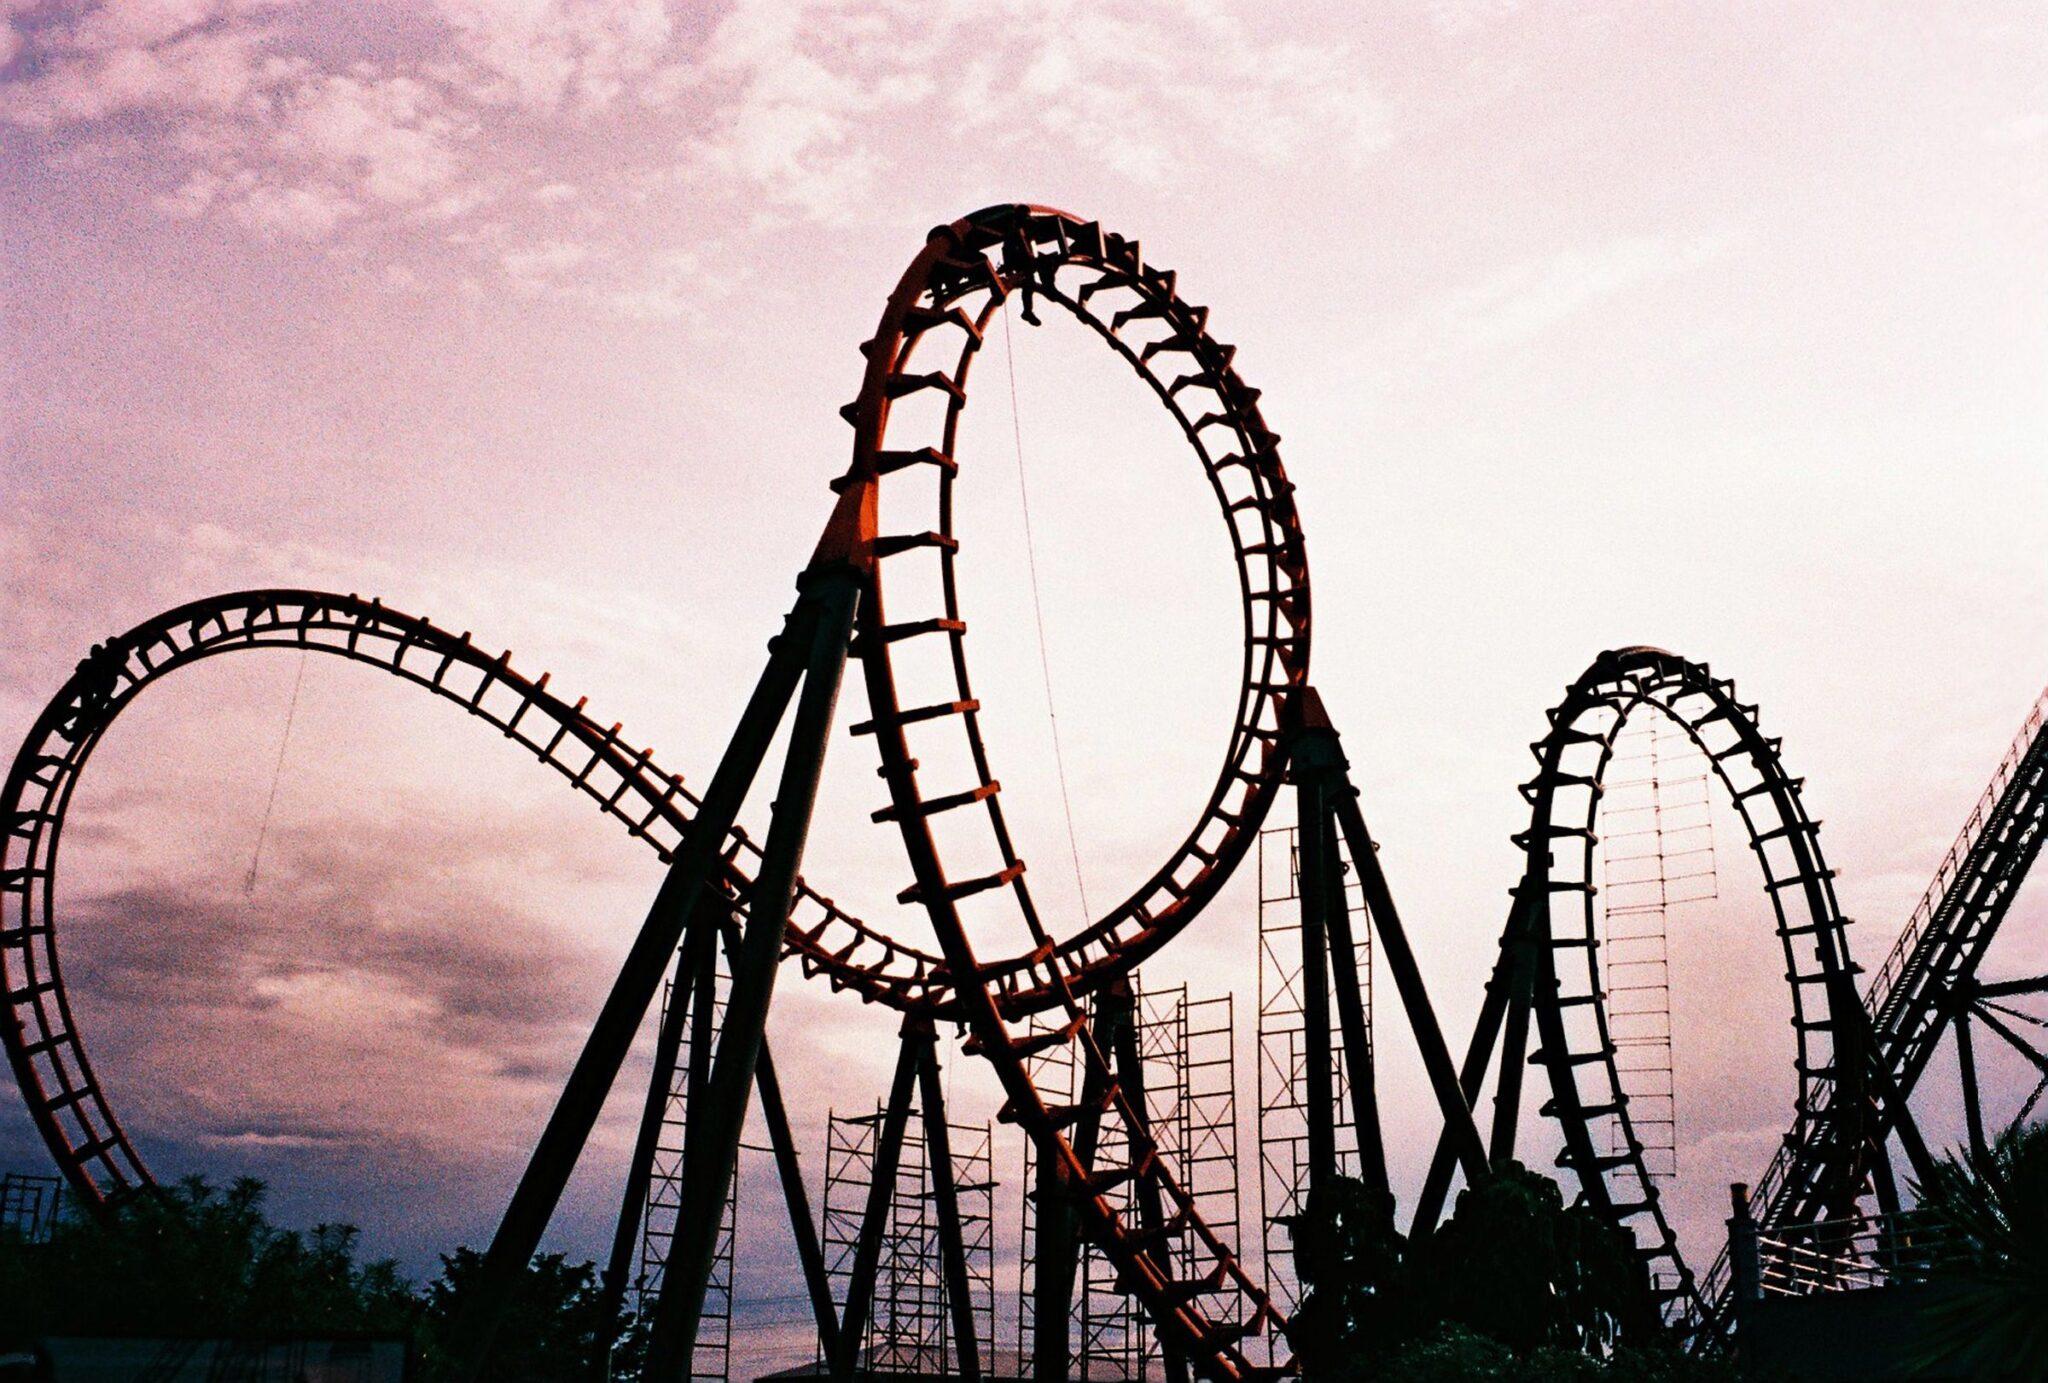 Au-delà de la hype, la courbe Gartner